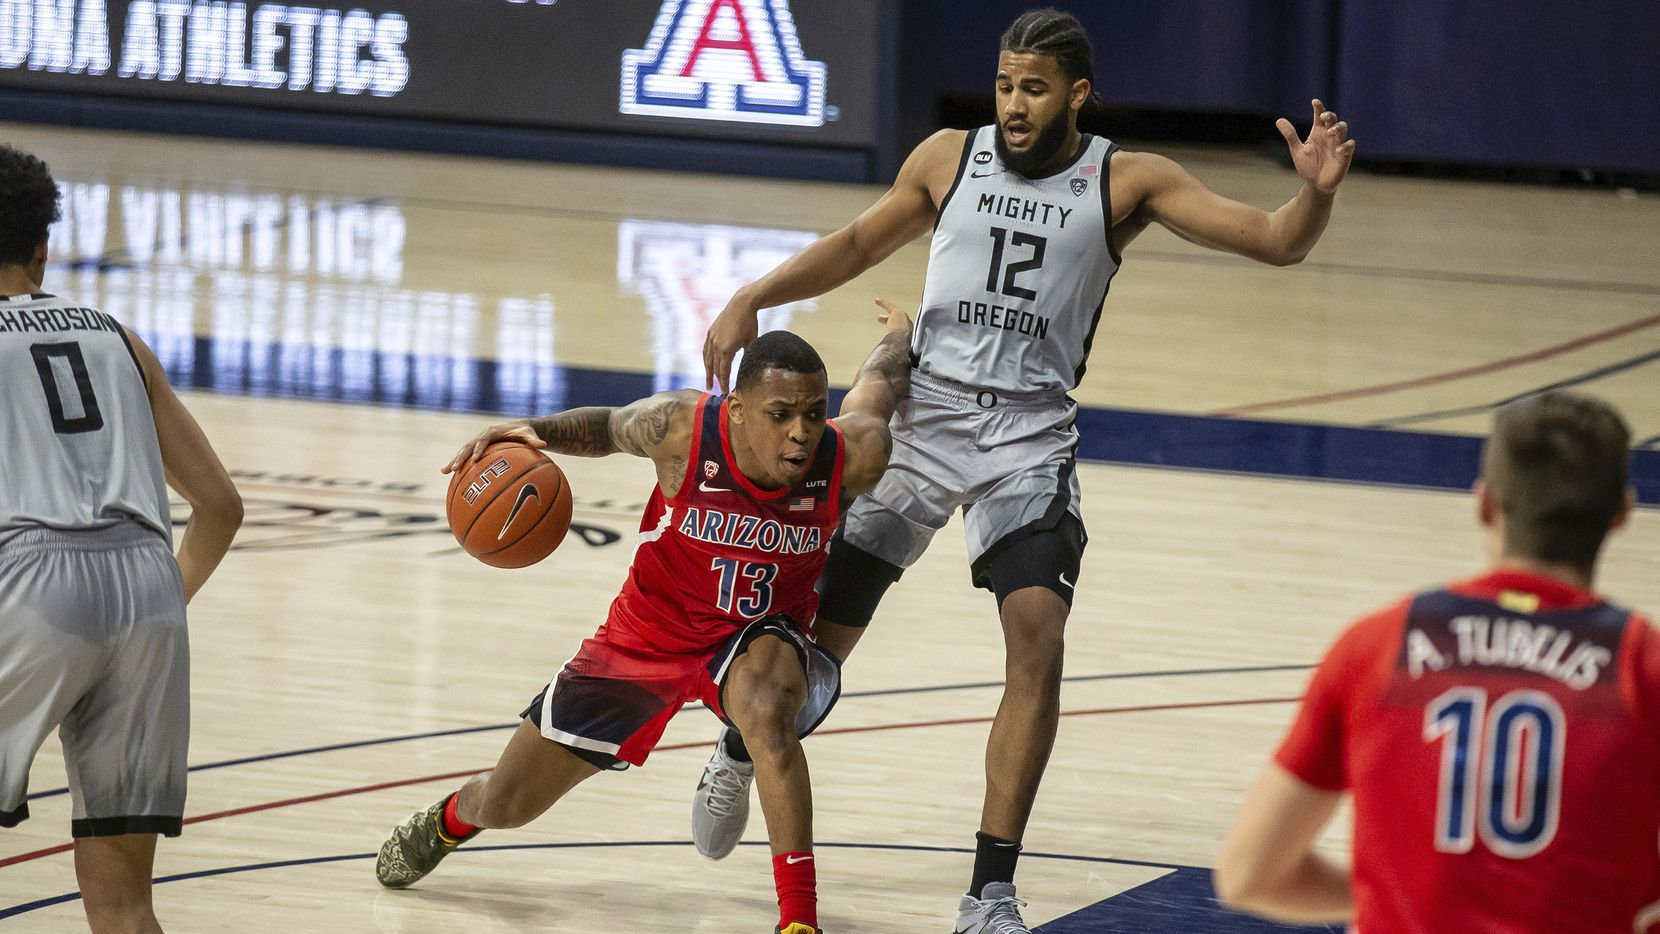 Arizona guard James Akinjo (13) moves the ball around Oregon guard LJ Figueroa (12) during an NCAA college basketball game, Saturday, Feb. 13, 2021, in Tucson, Ariz.